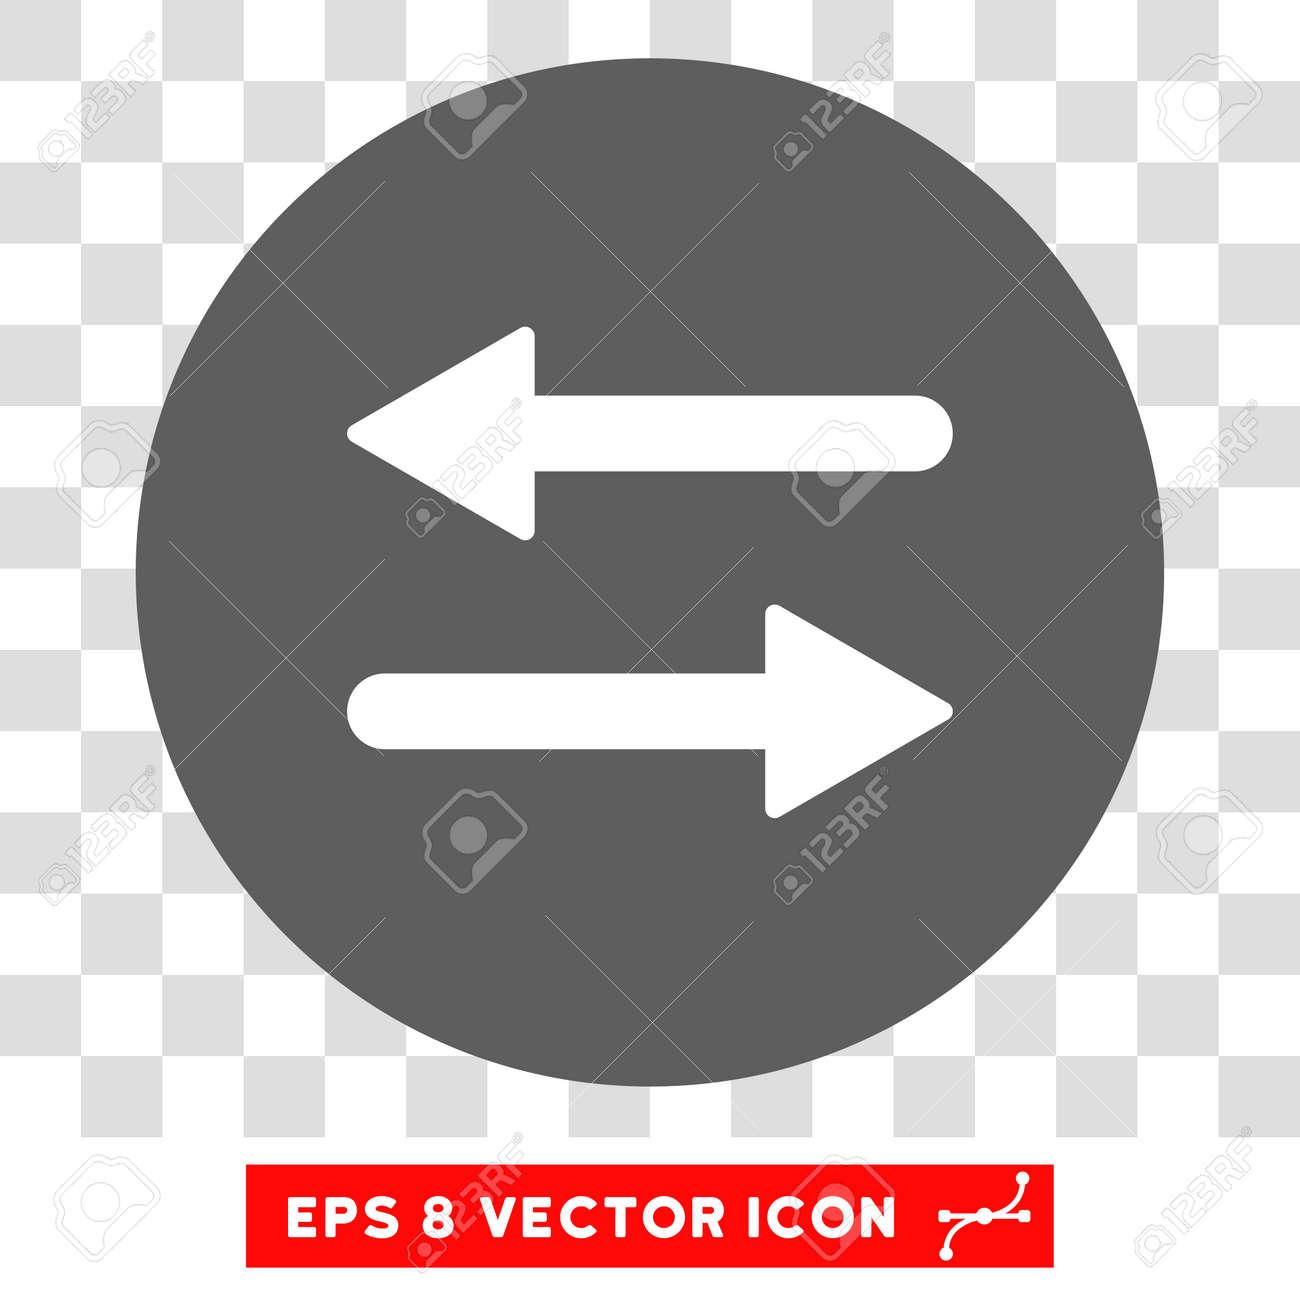 Horizontal exchange arrows round icon vector eps illustration horizontal exchange arrows round icon vector eps illustration style is flat iconic bicolor symbol buycottarizona